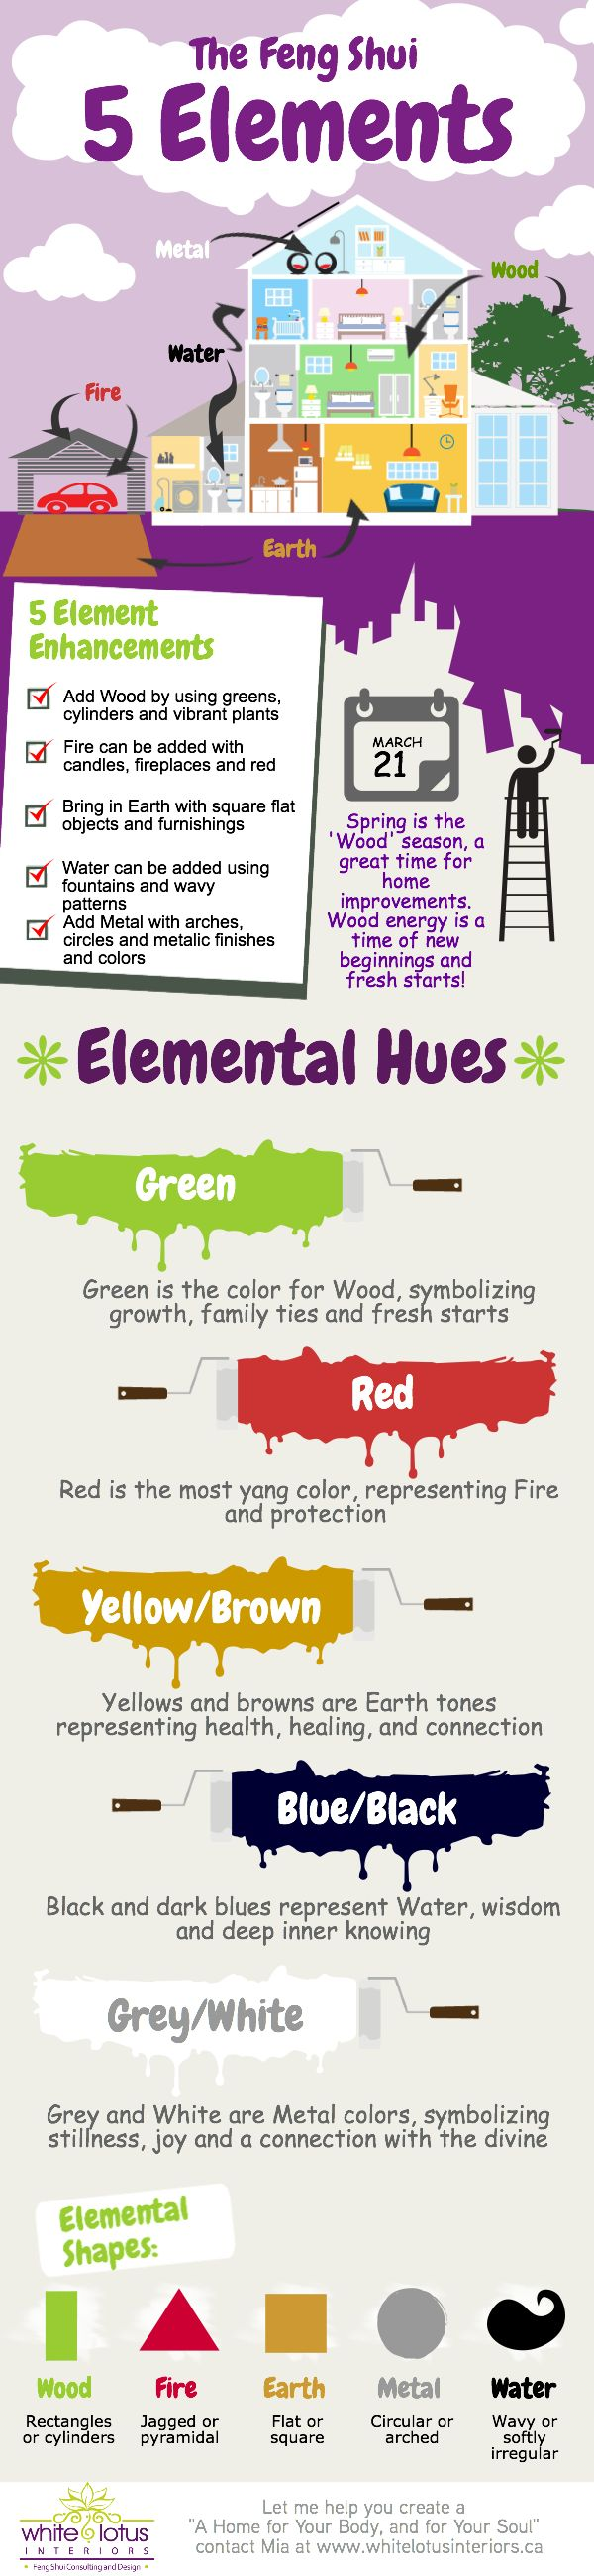 A visual description of the Feng Shui 5 Elements #LivingFengShui